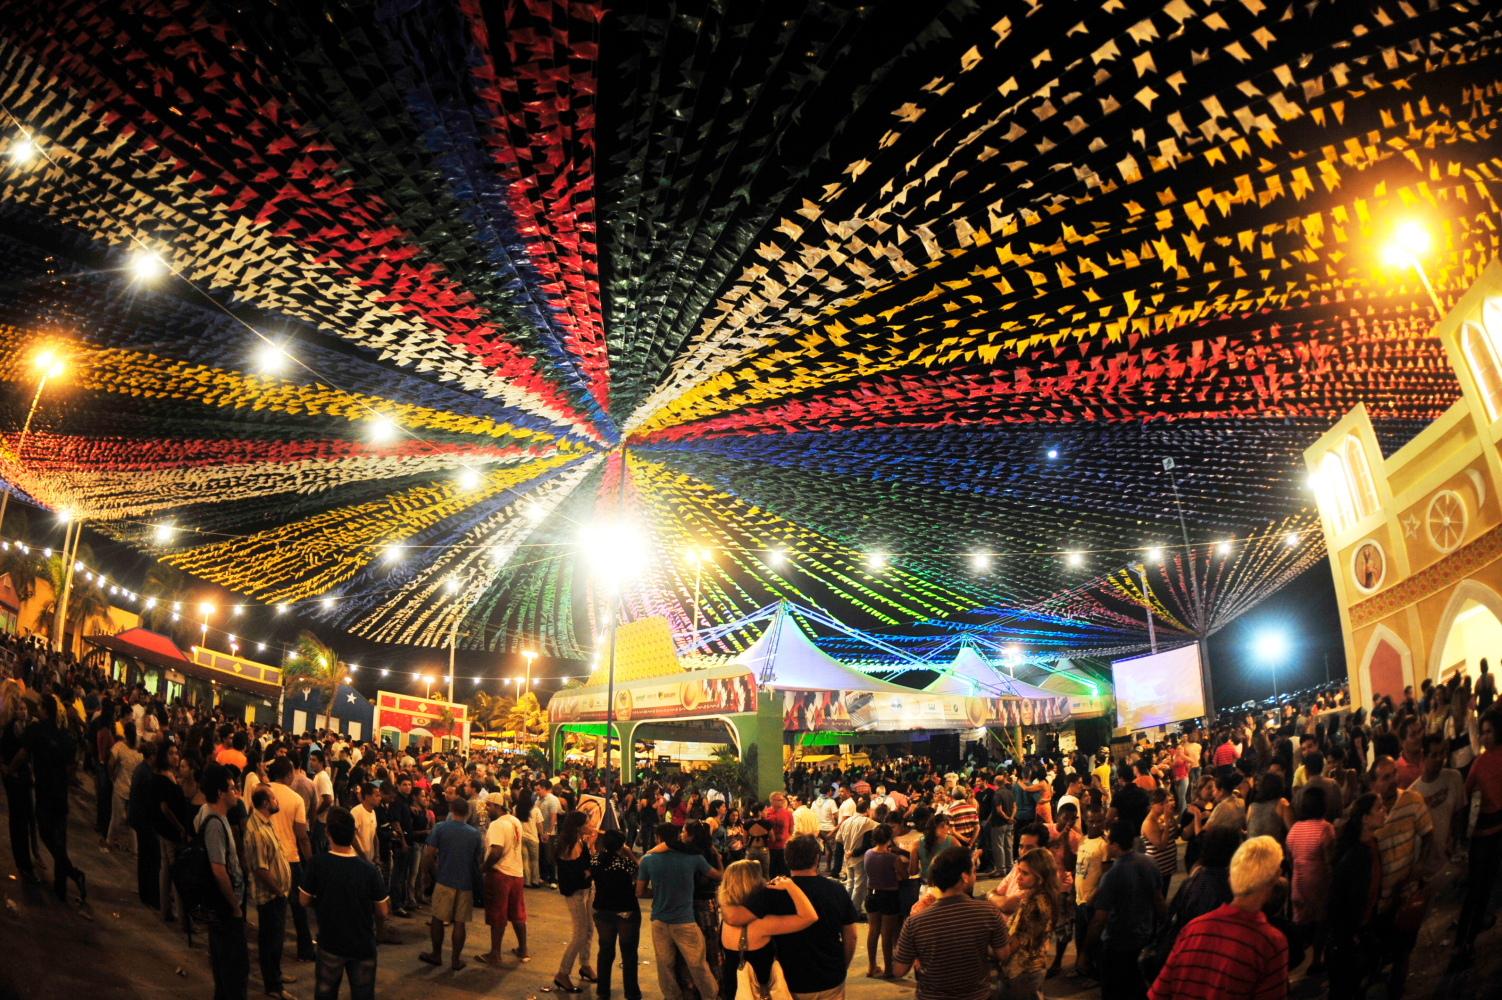 FESTAS JUNINAS – Le feste di metà anno